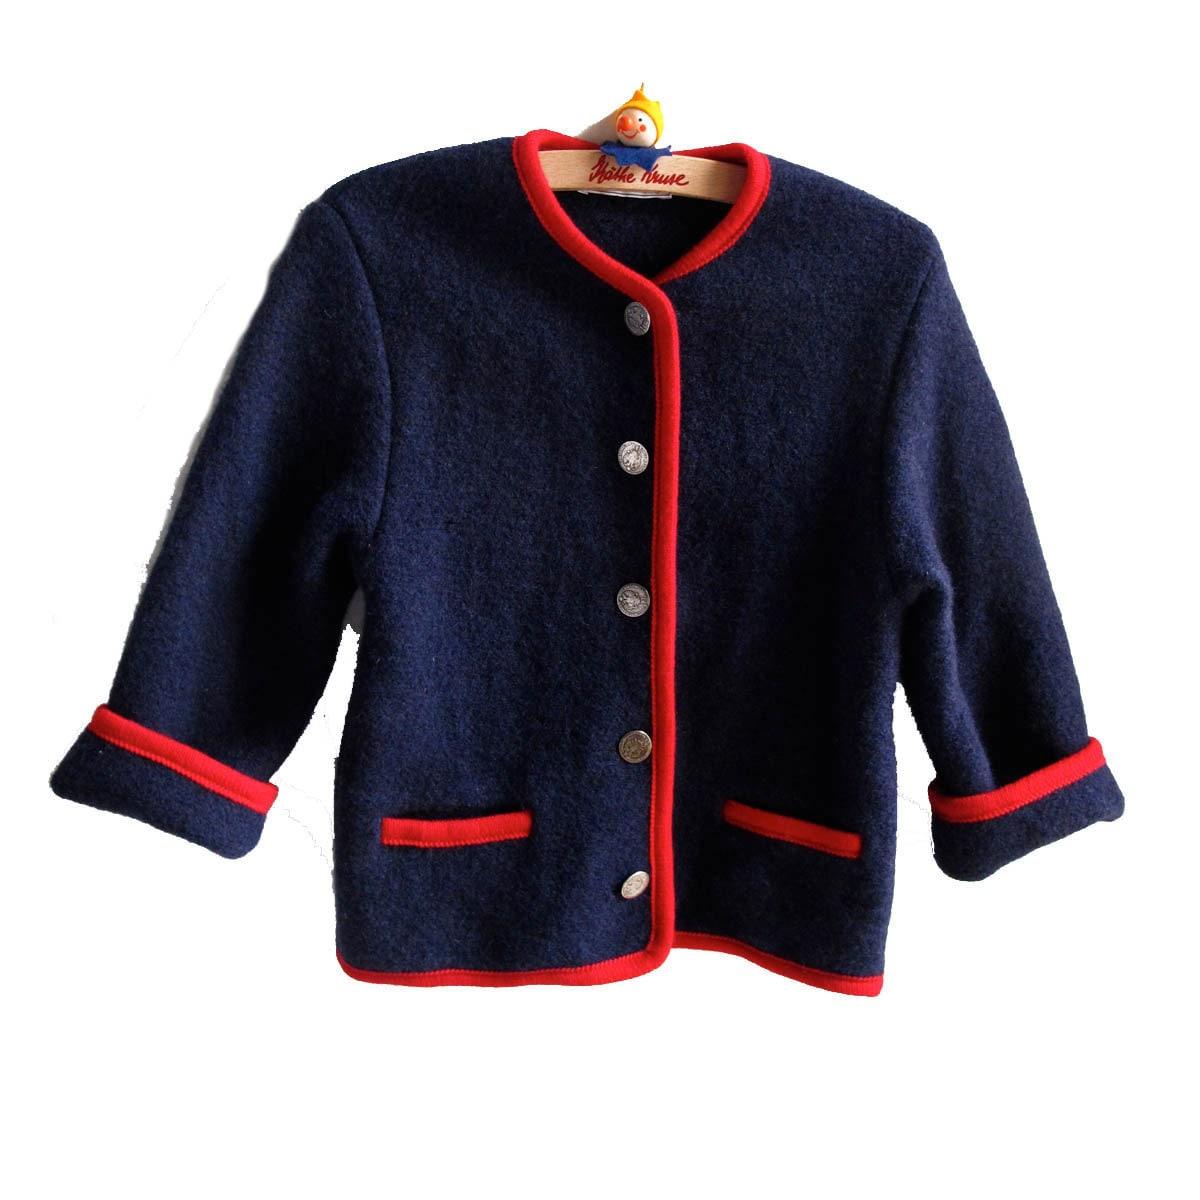 Mens Red Cardigan Sweater